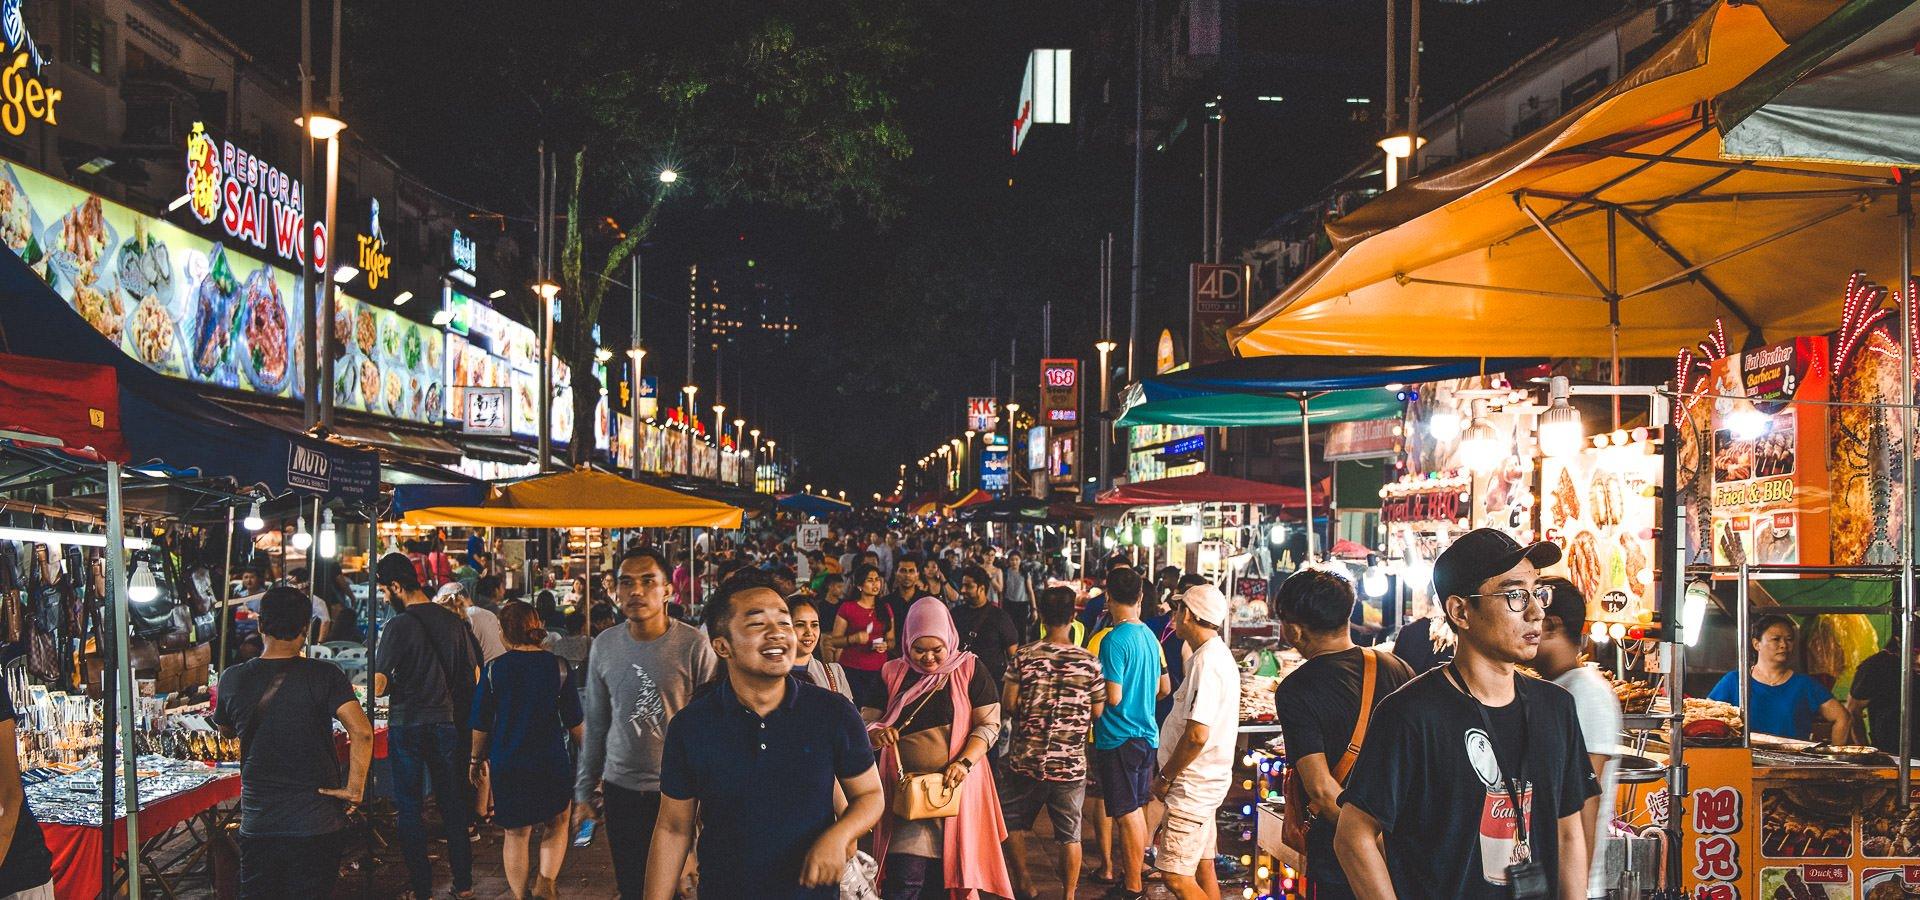 A Tasty Encounter at Jalan Alor Street Food Market, Kuala Lumpur | jalan alor night market 18